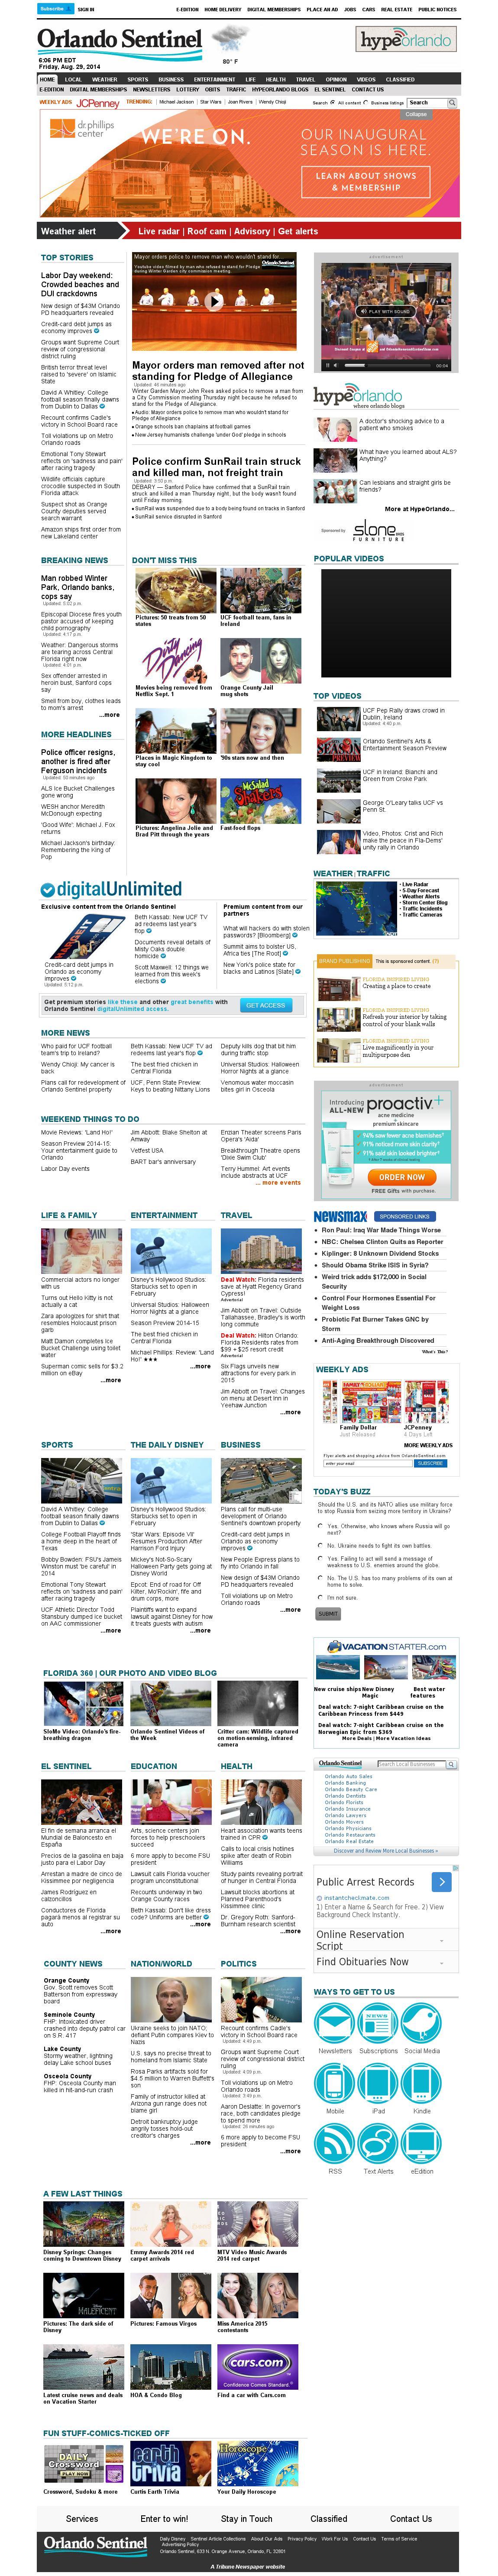 Orlando Sentinel at Friday Aug. 29, 2014, 10:12 p.m. UTC